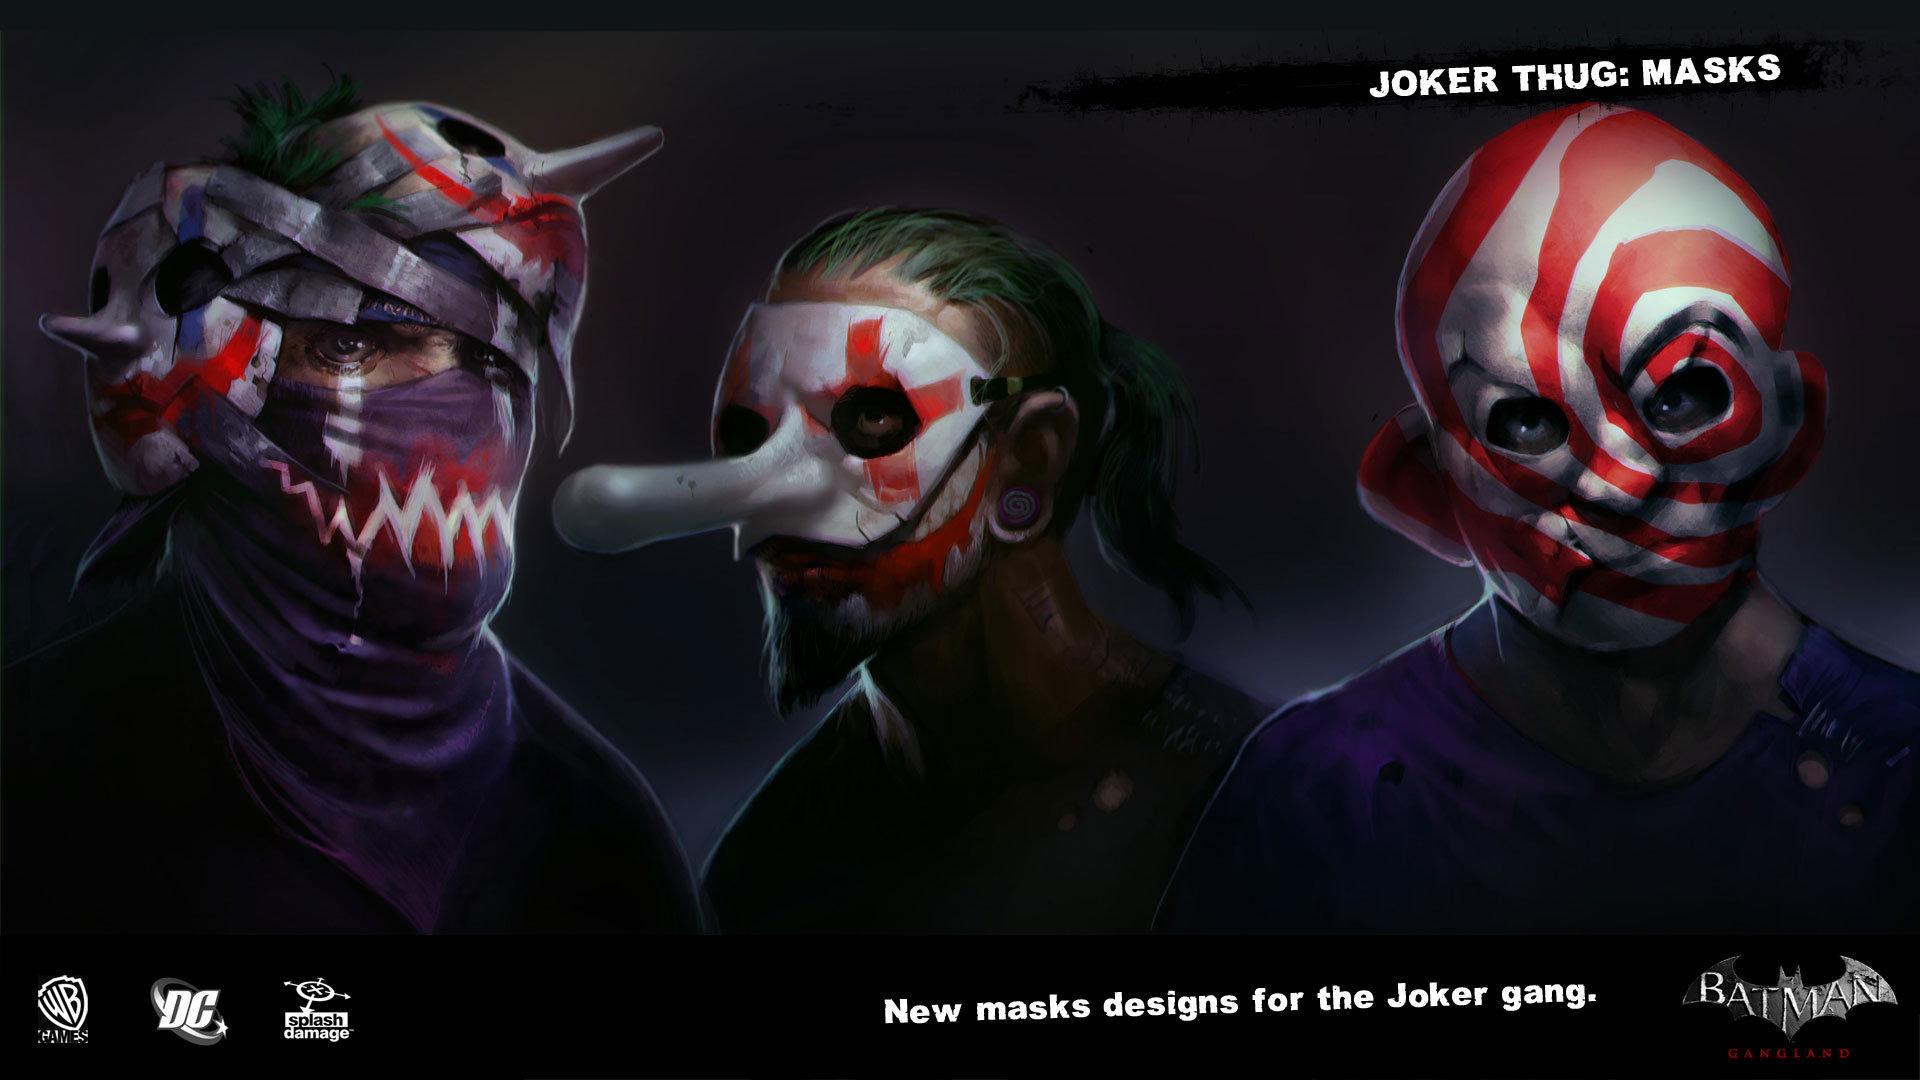 Manuel augusto dischinger moura splashdamage joker thug outfit masks